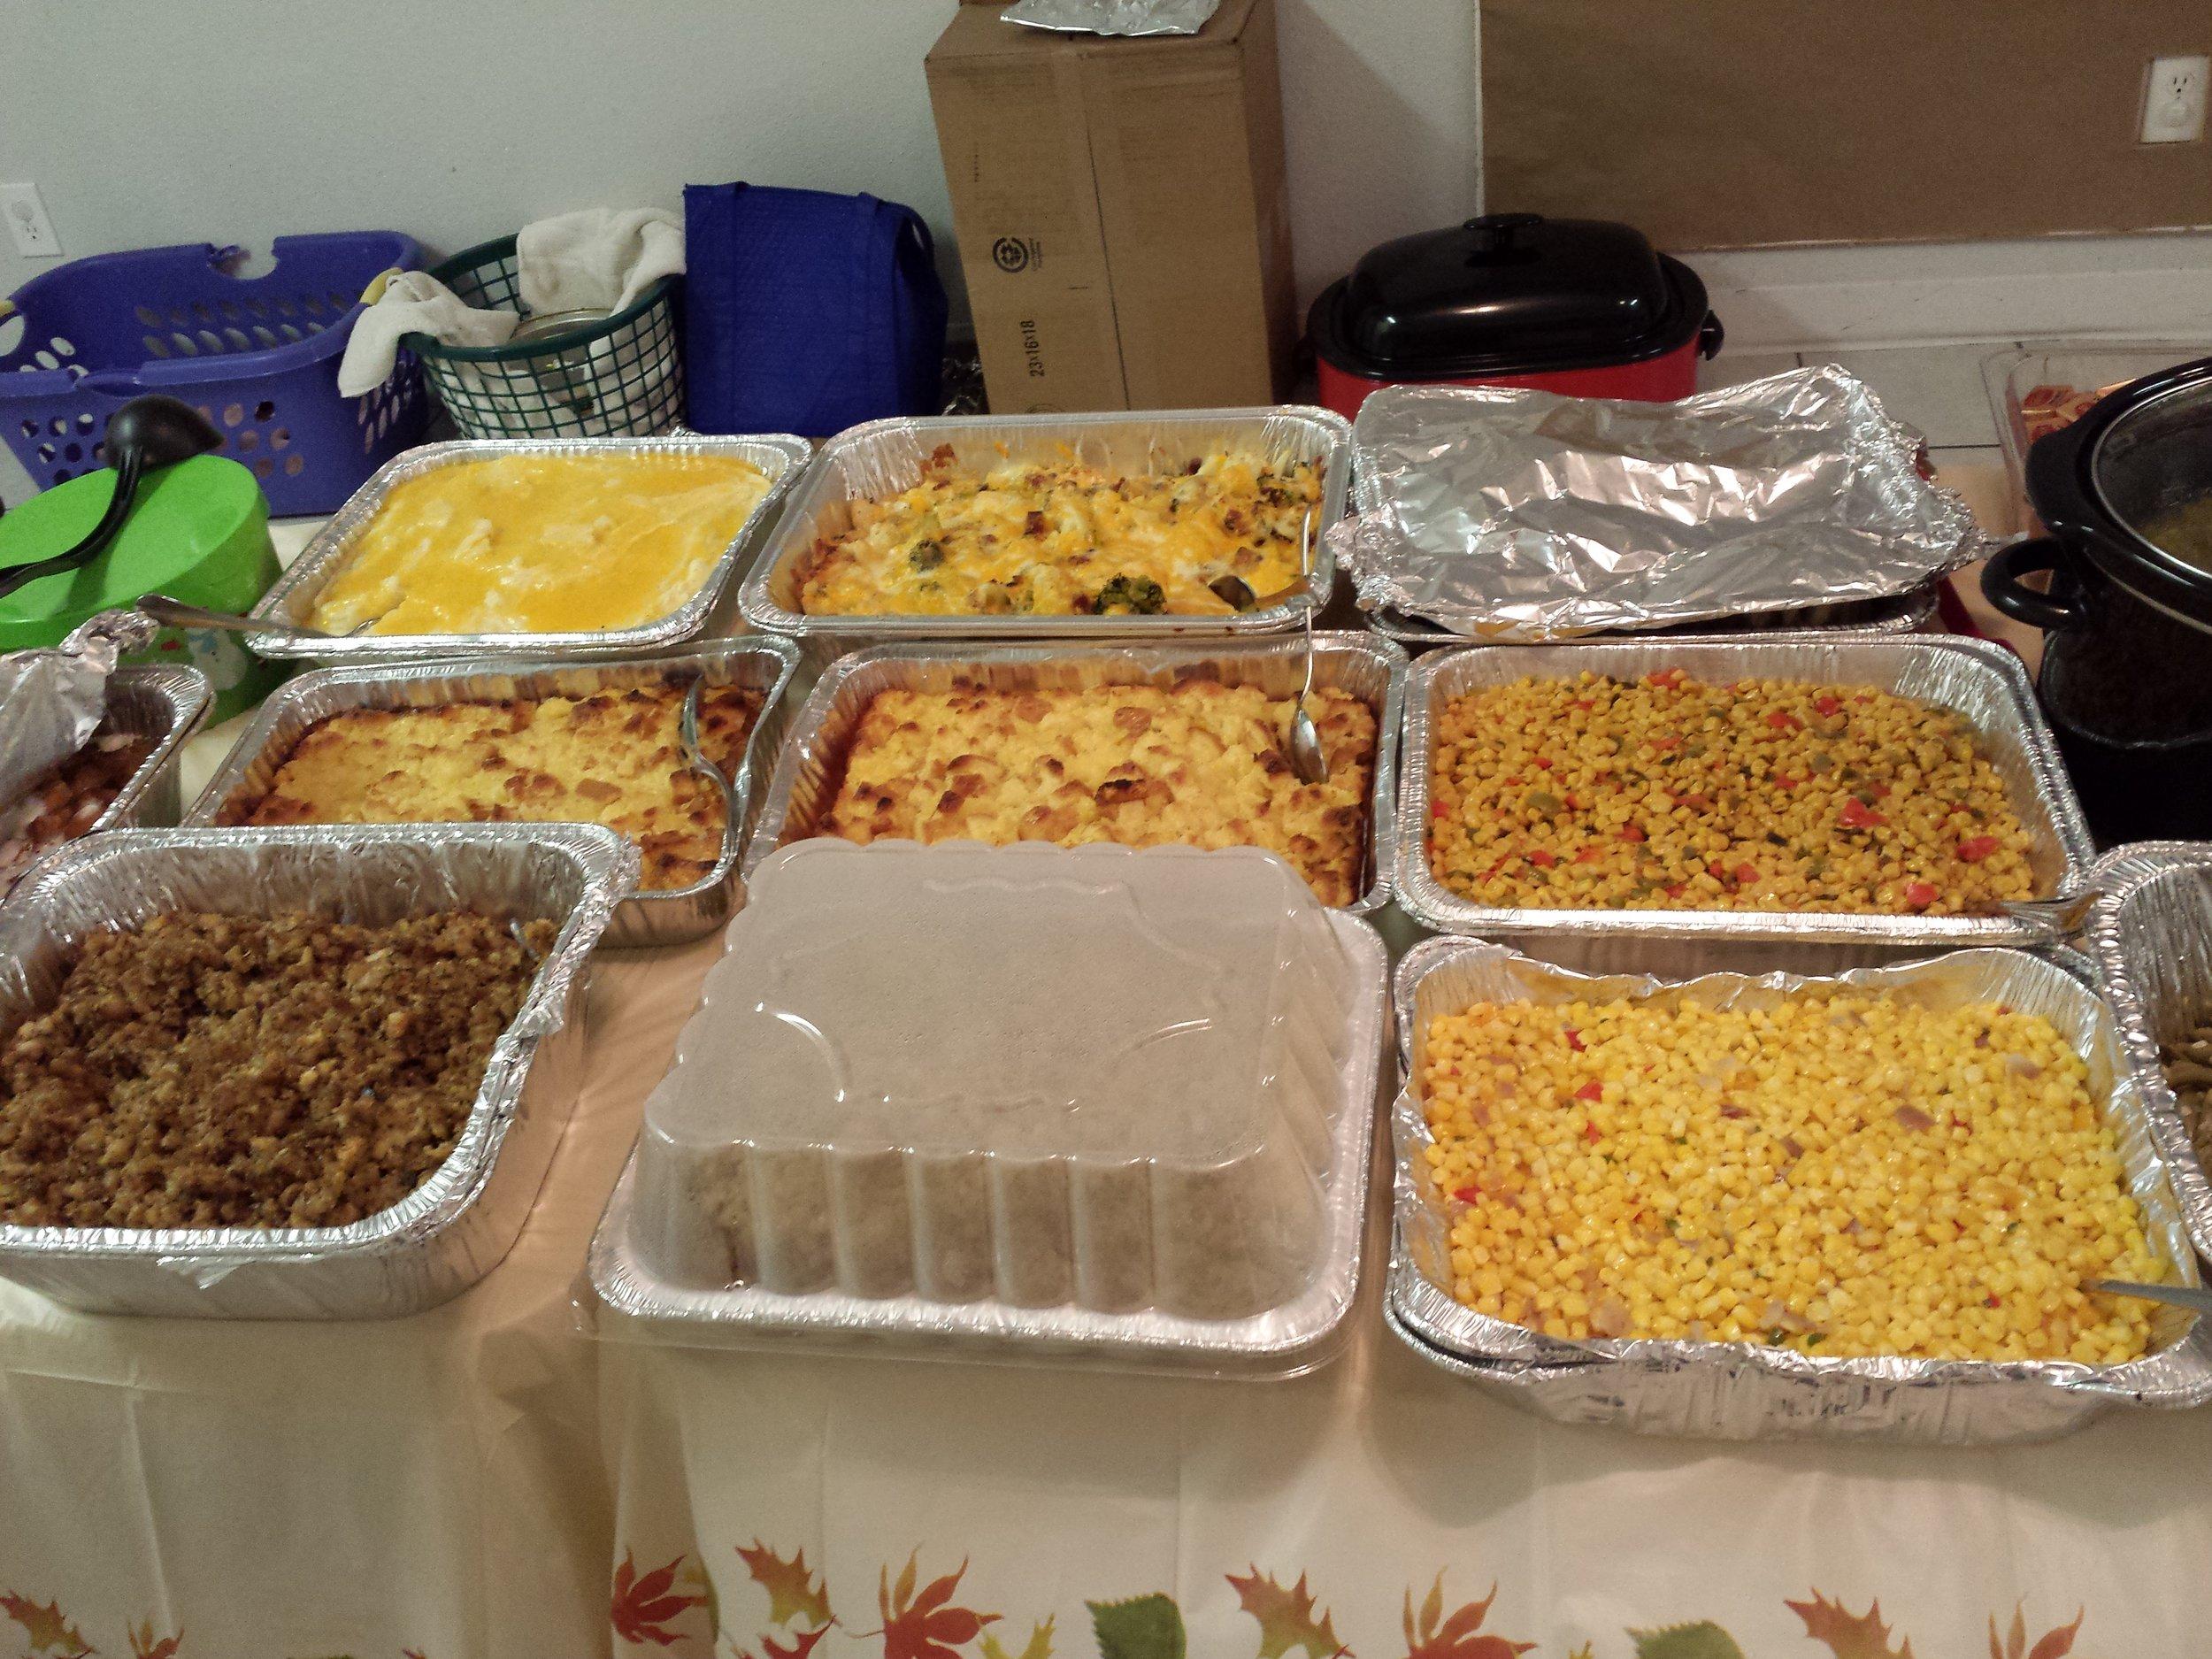 Food, food and more food.